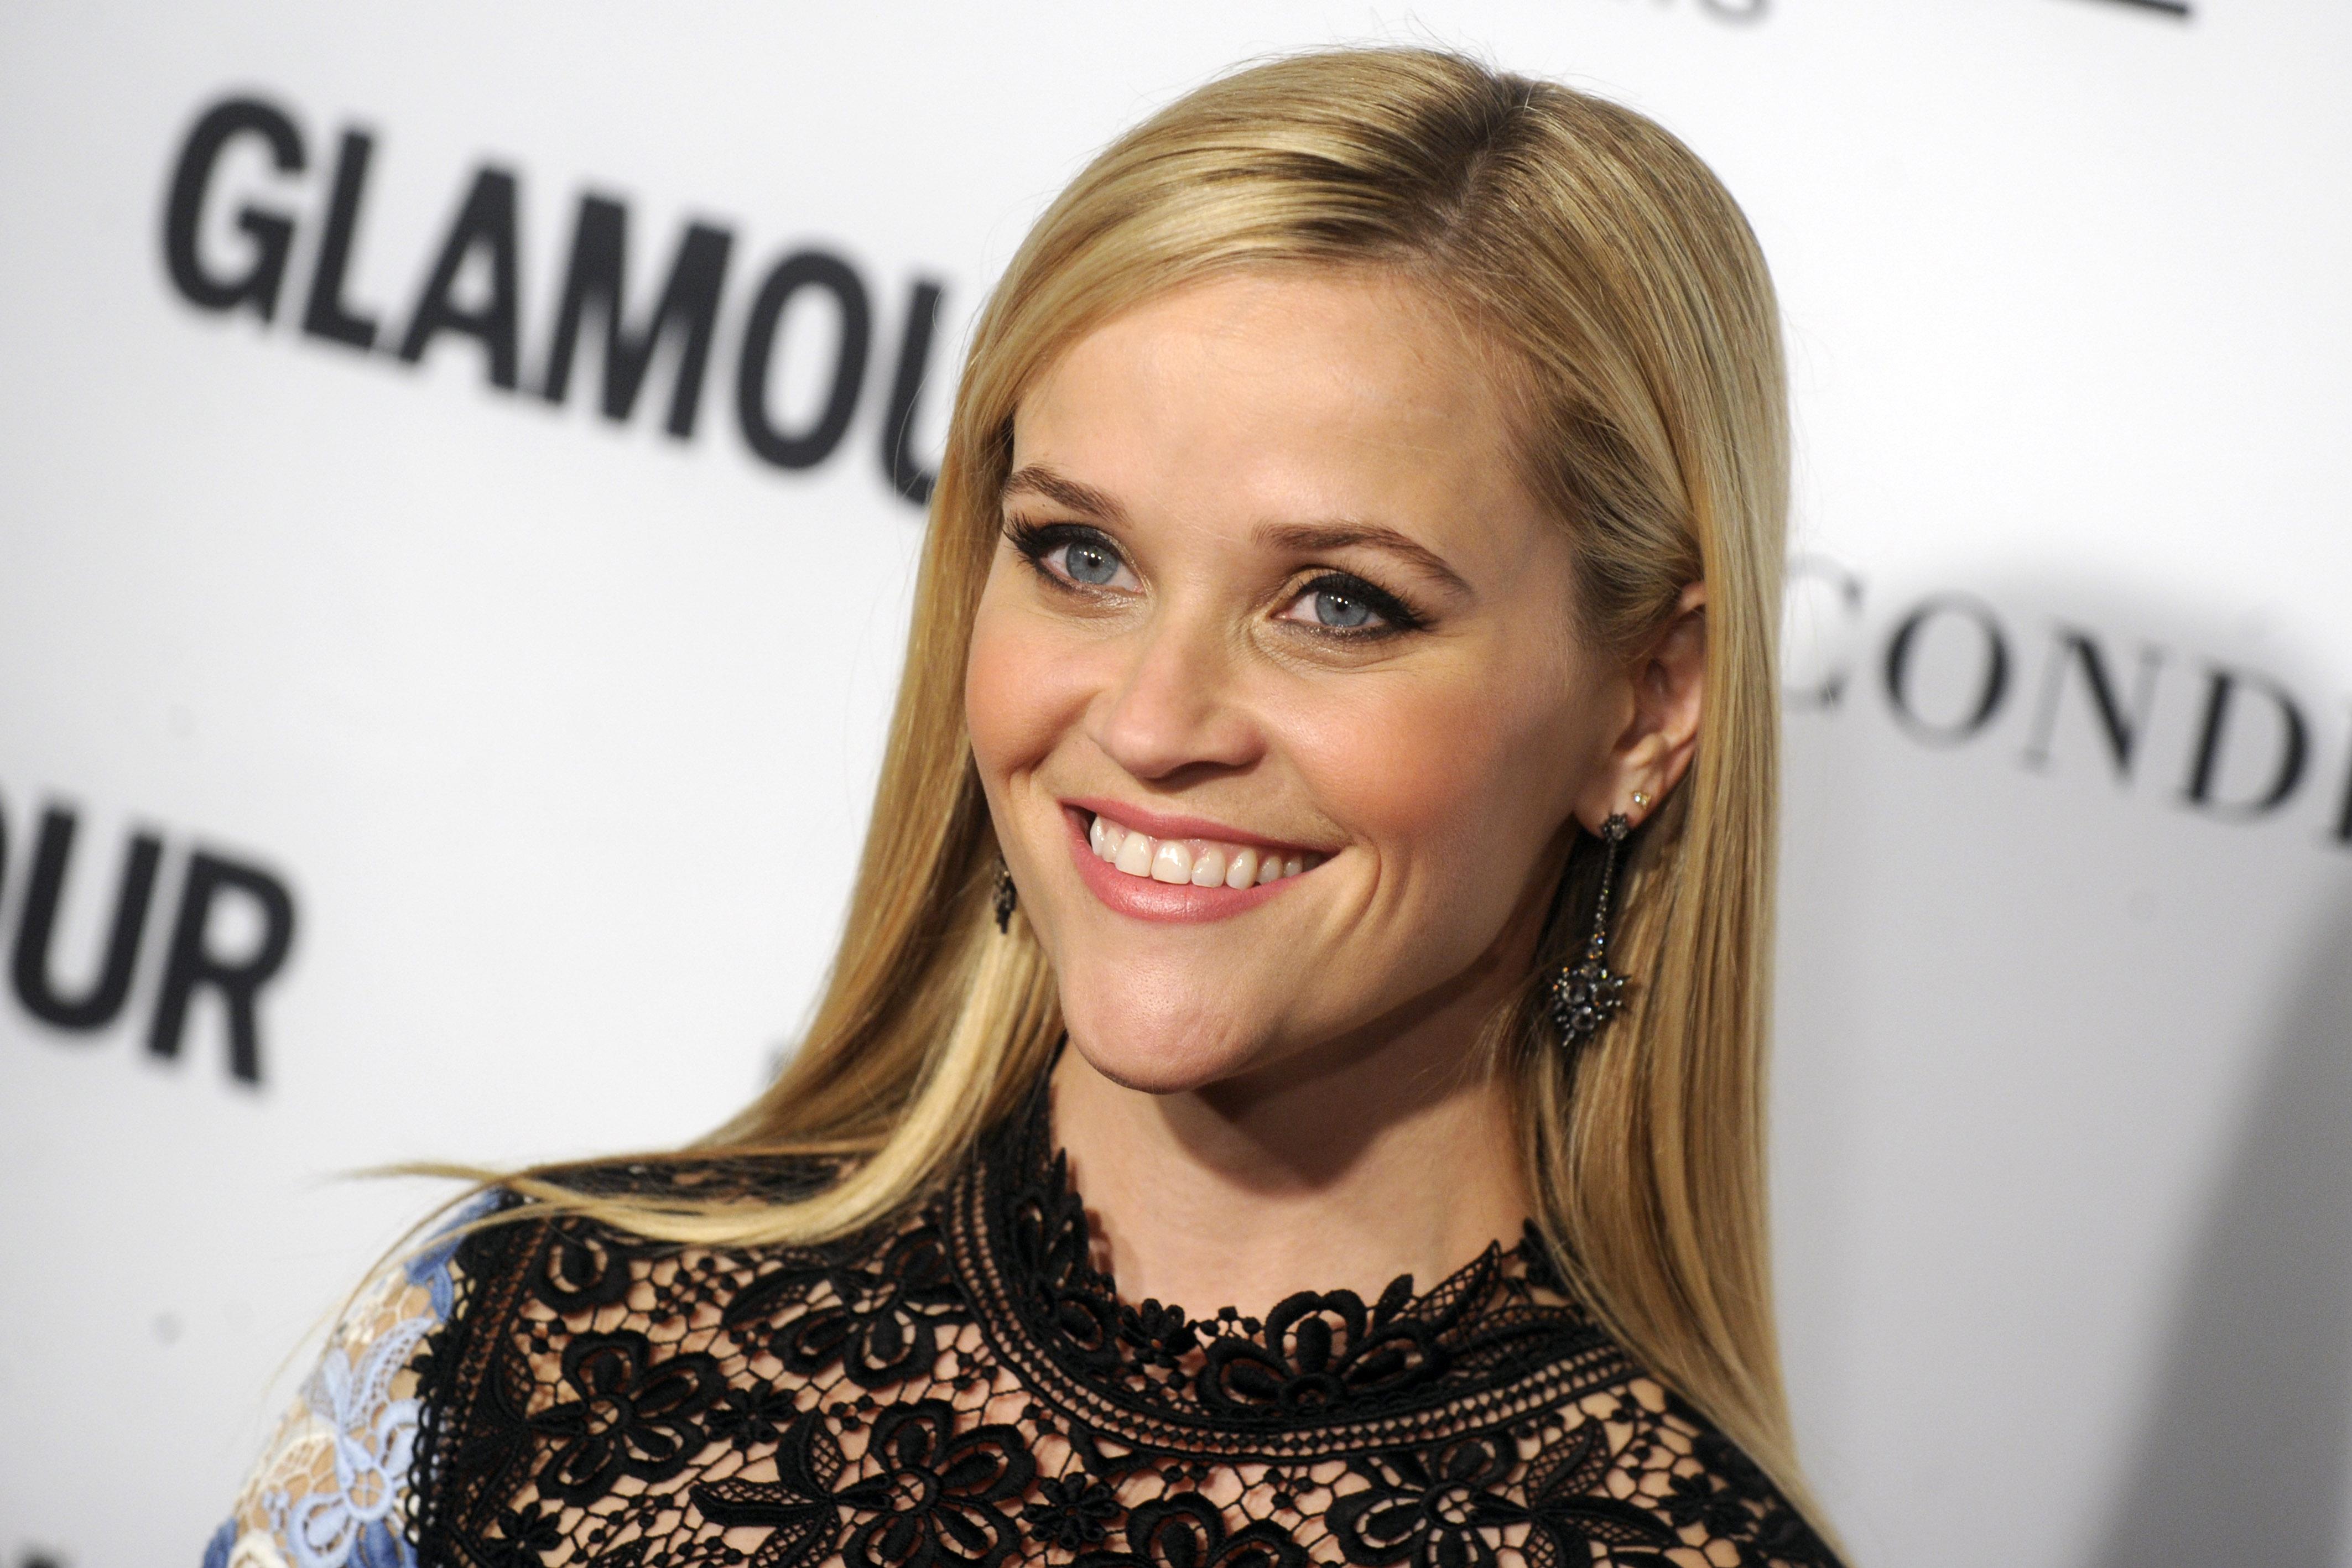 Риз Уизерспун (Reese Witherspoon), биография